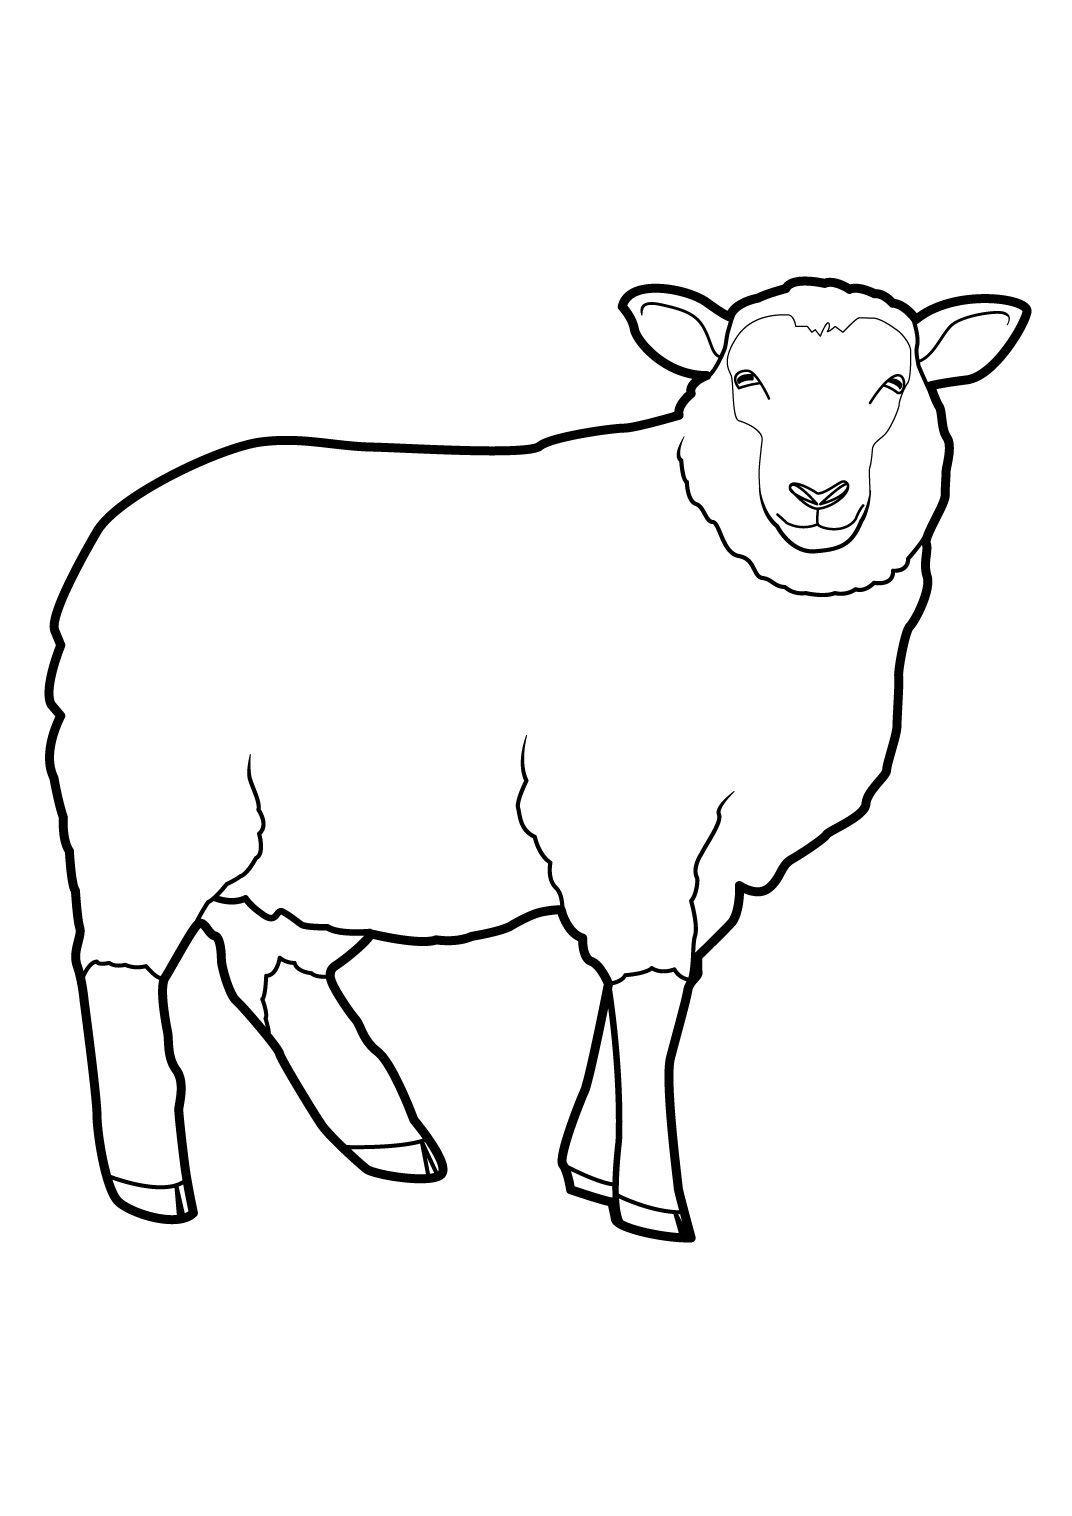 Coloriage Mouton 3 - Coloriage Moutons - Coloriages Animaux